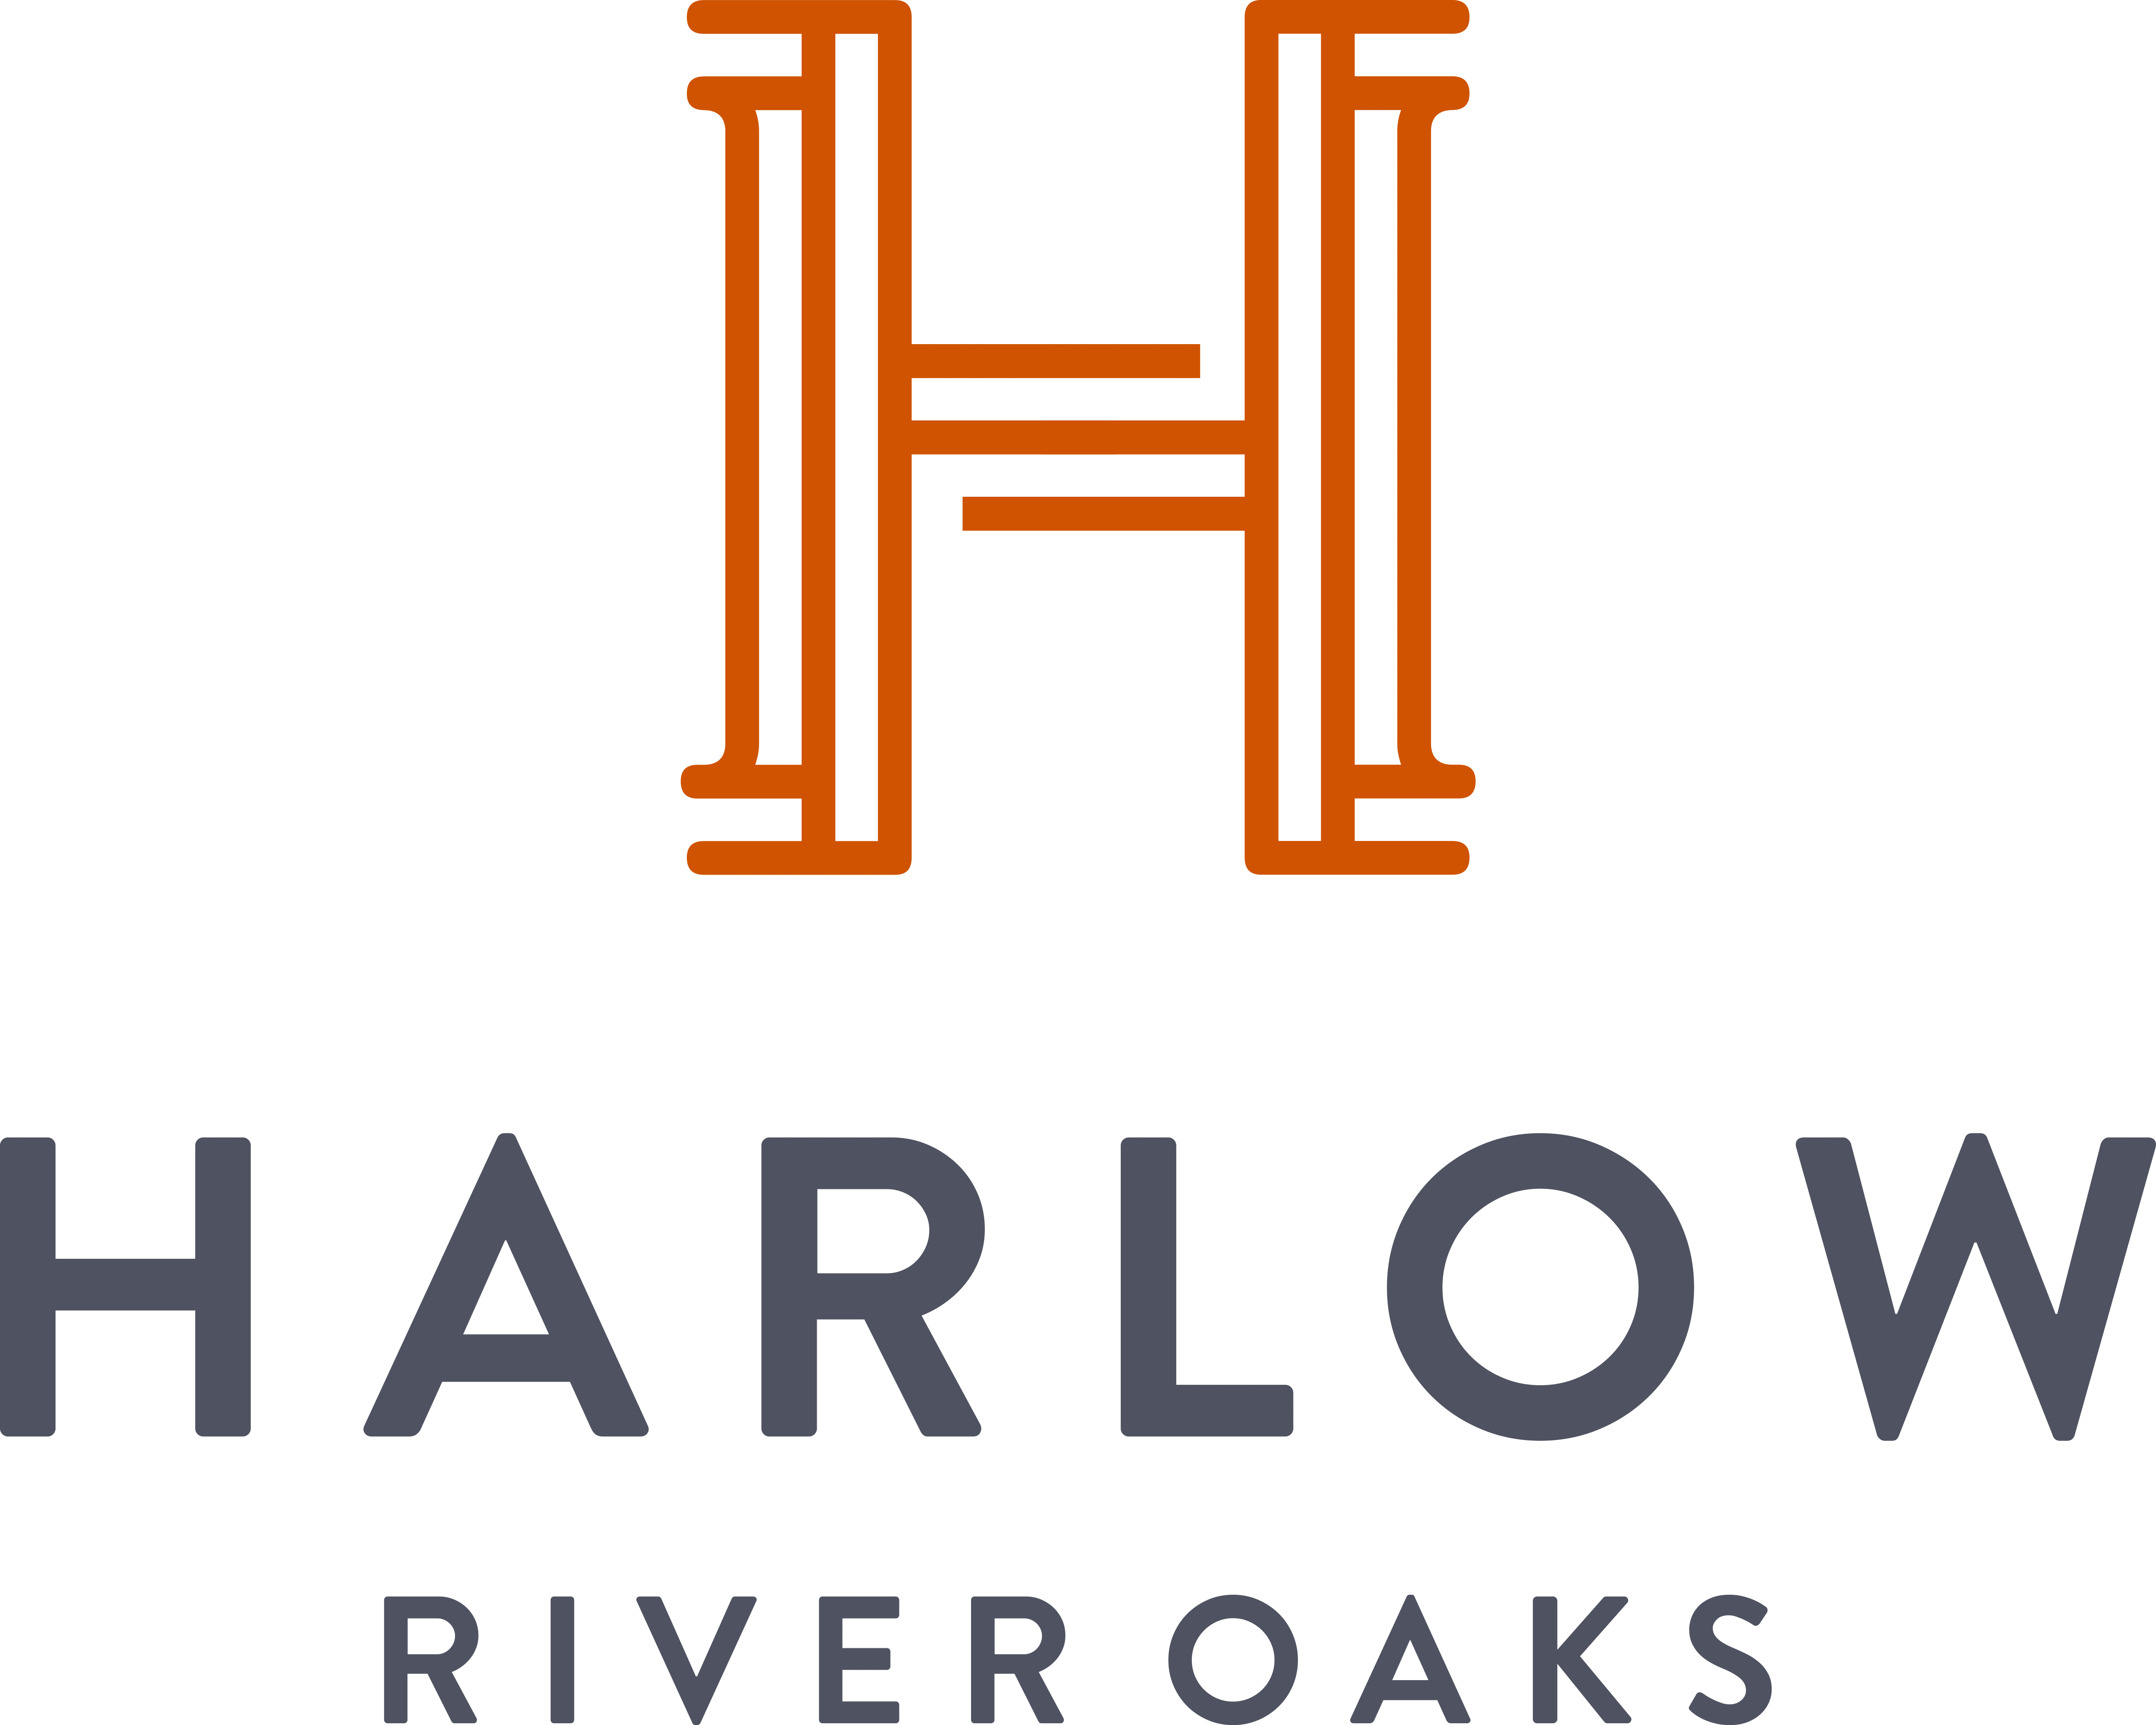 harlow river oaks logo